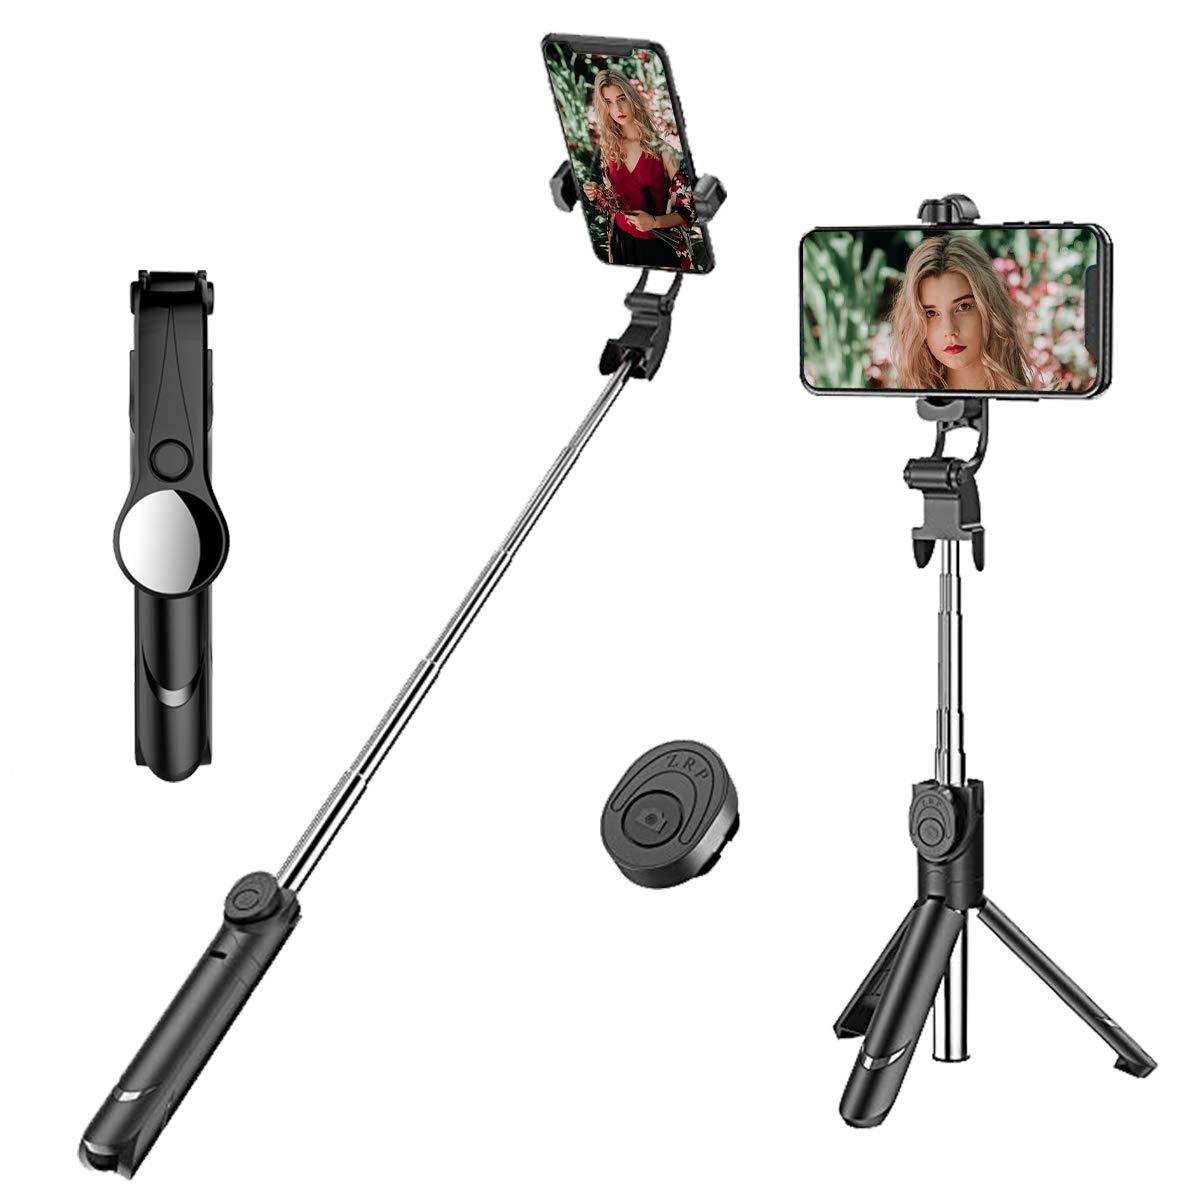 Palo para Selfie Monopod telescópico extensible para cámara del teléfono móvil soporte de todos